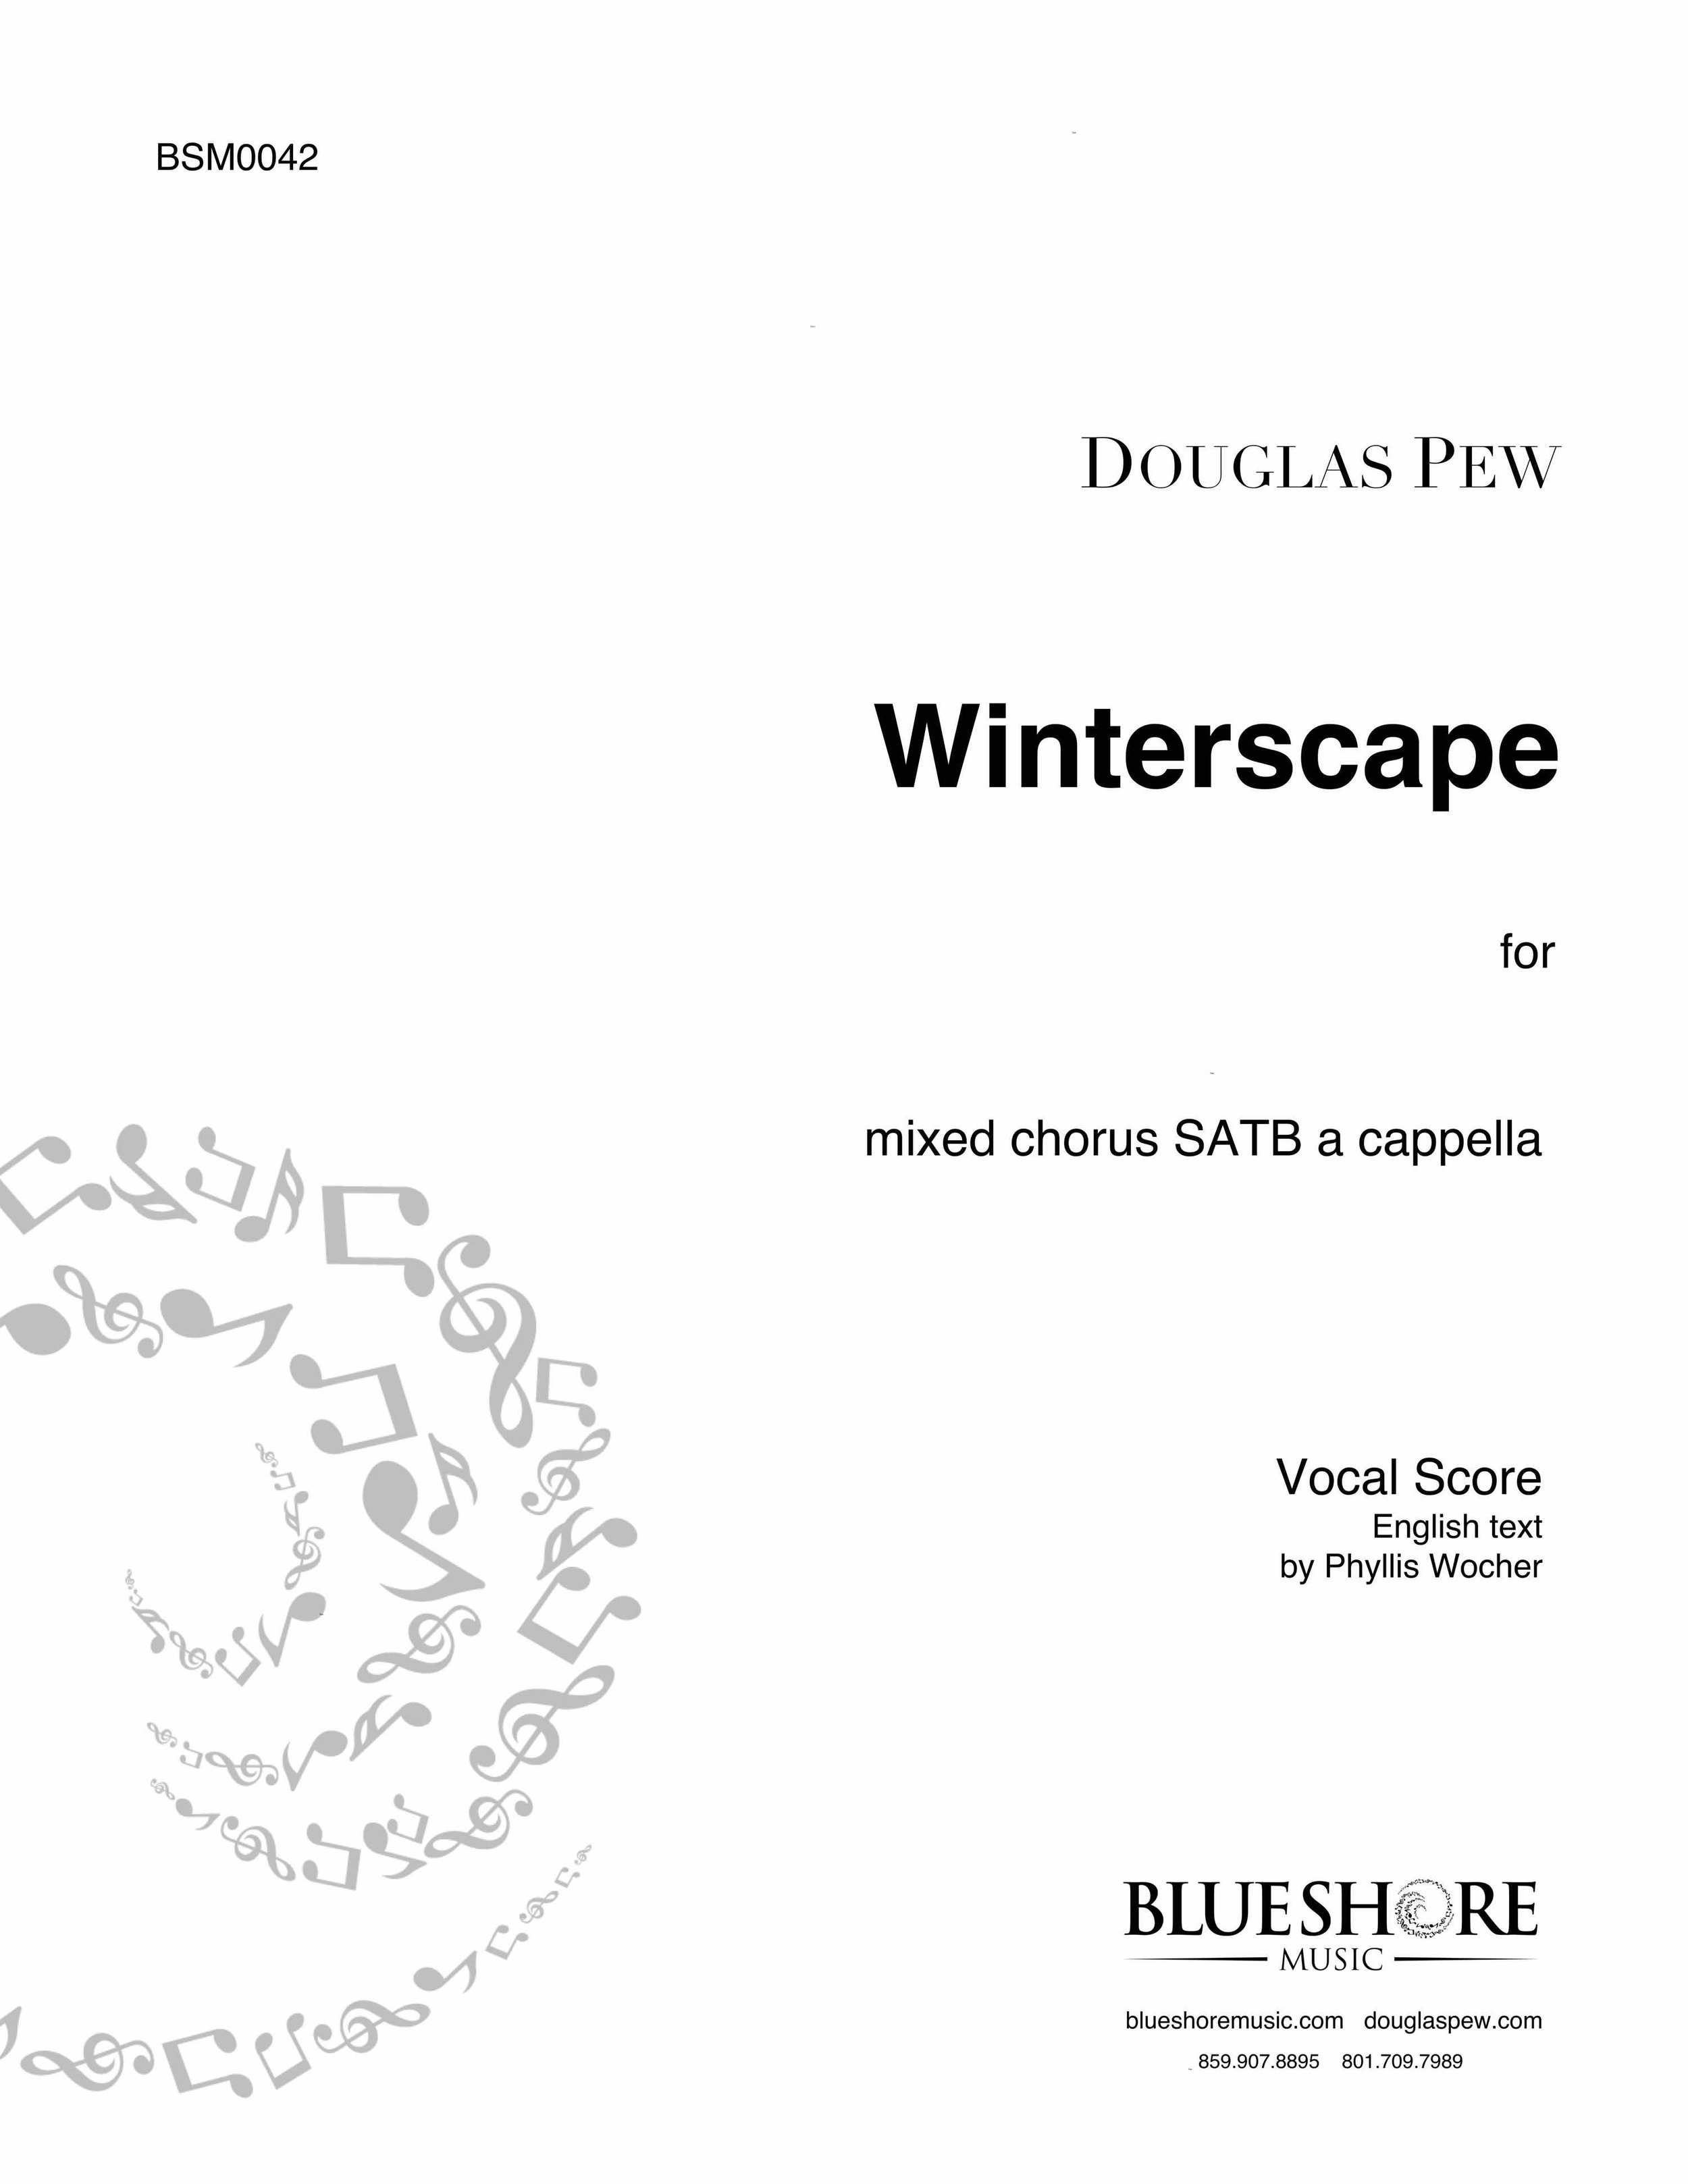 Winterscape, Christmas Carol for SATB a cappella